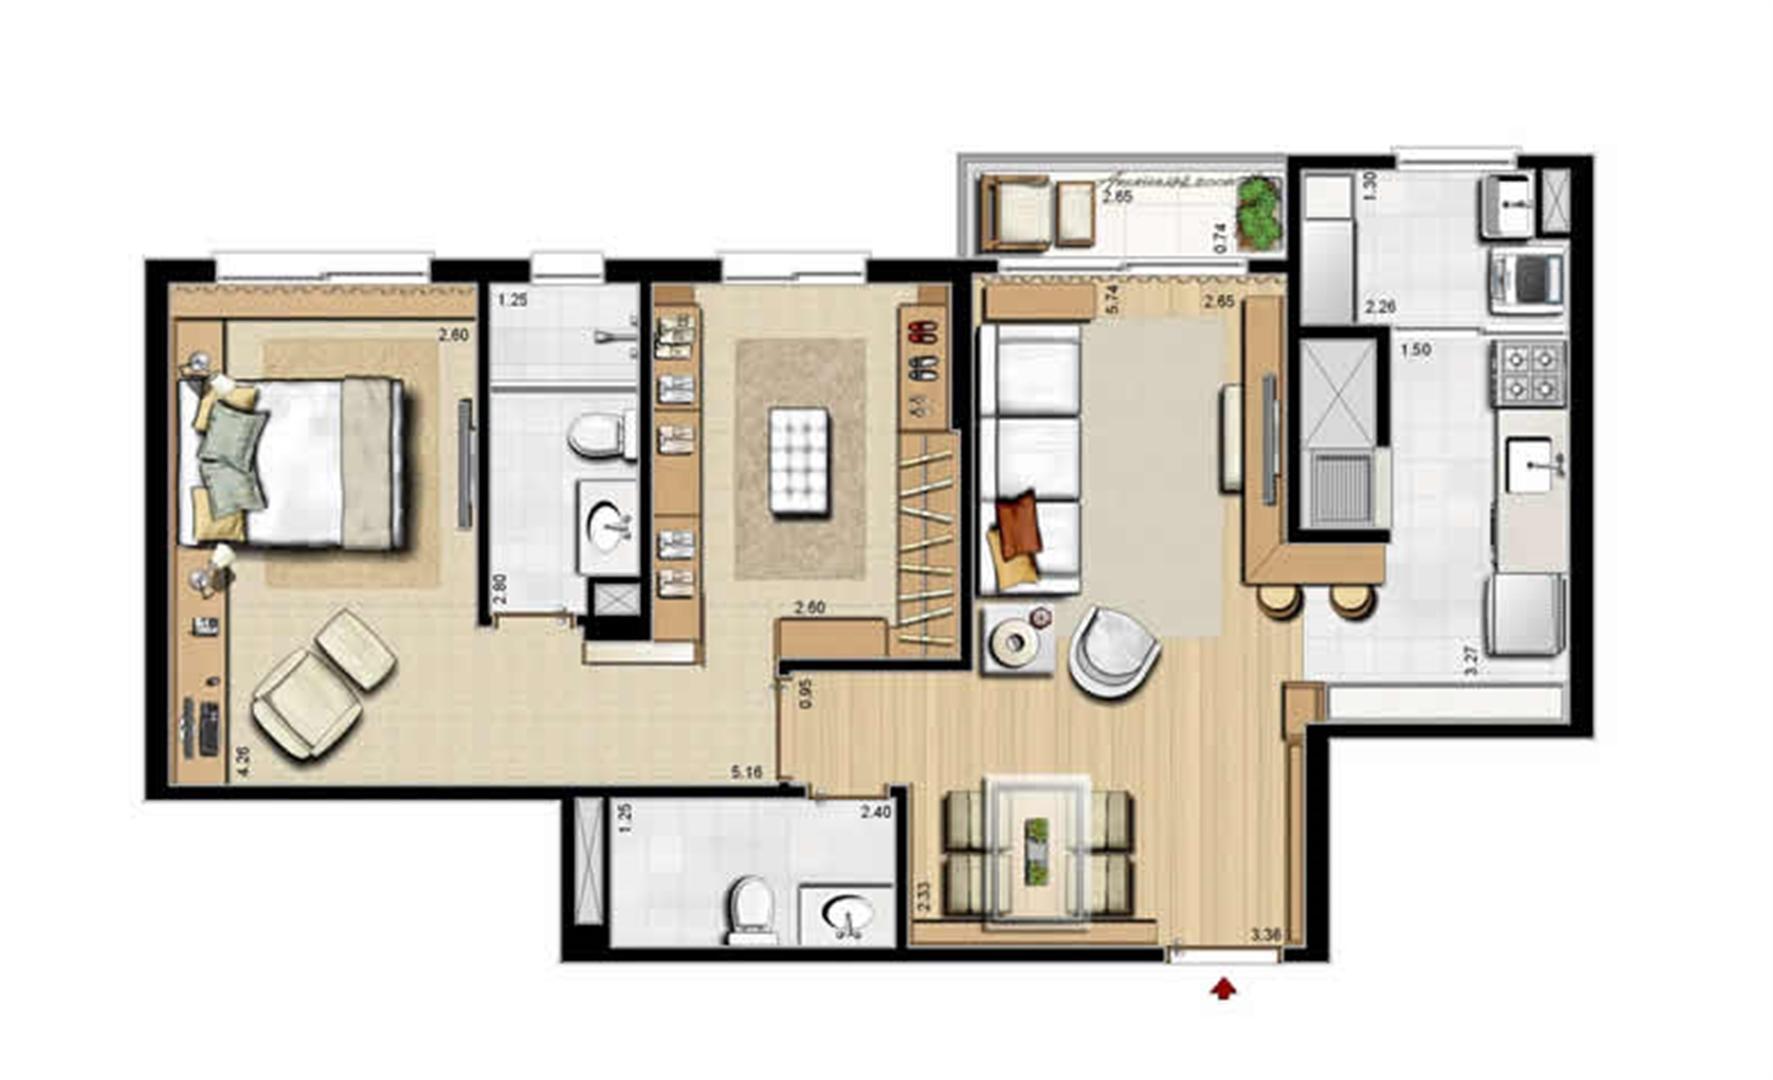 Opção suíte master e lavabo - 68 m² privativos e 105 m² área total | Villa Mimosa Vita Insolaratta – Apartamento no  Centro - Canoas - Rio Grande do Sul